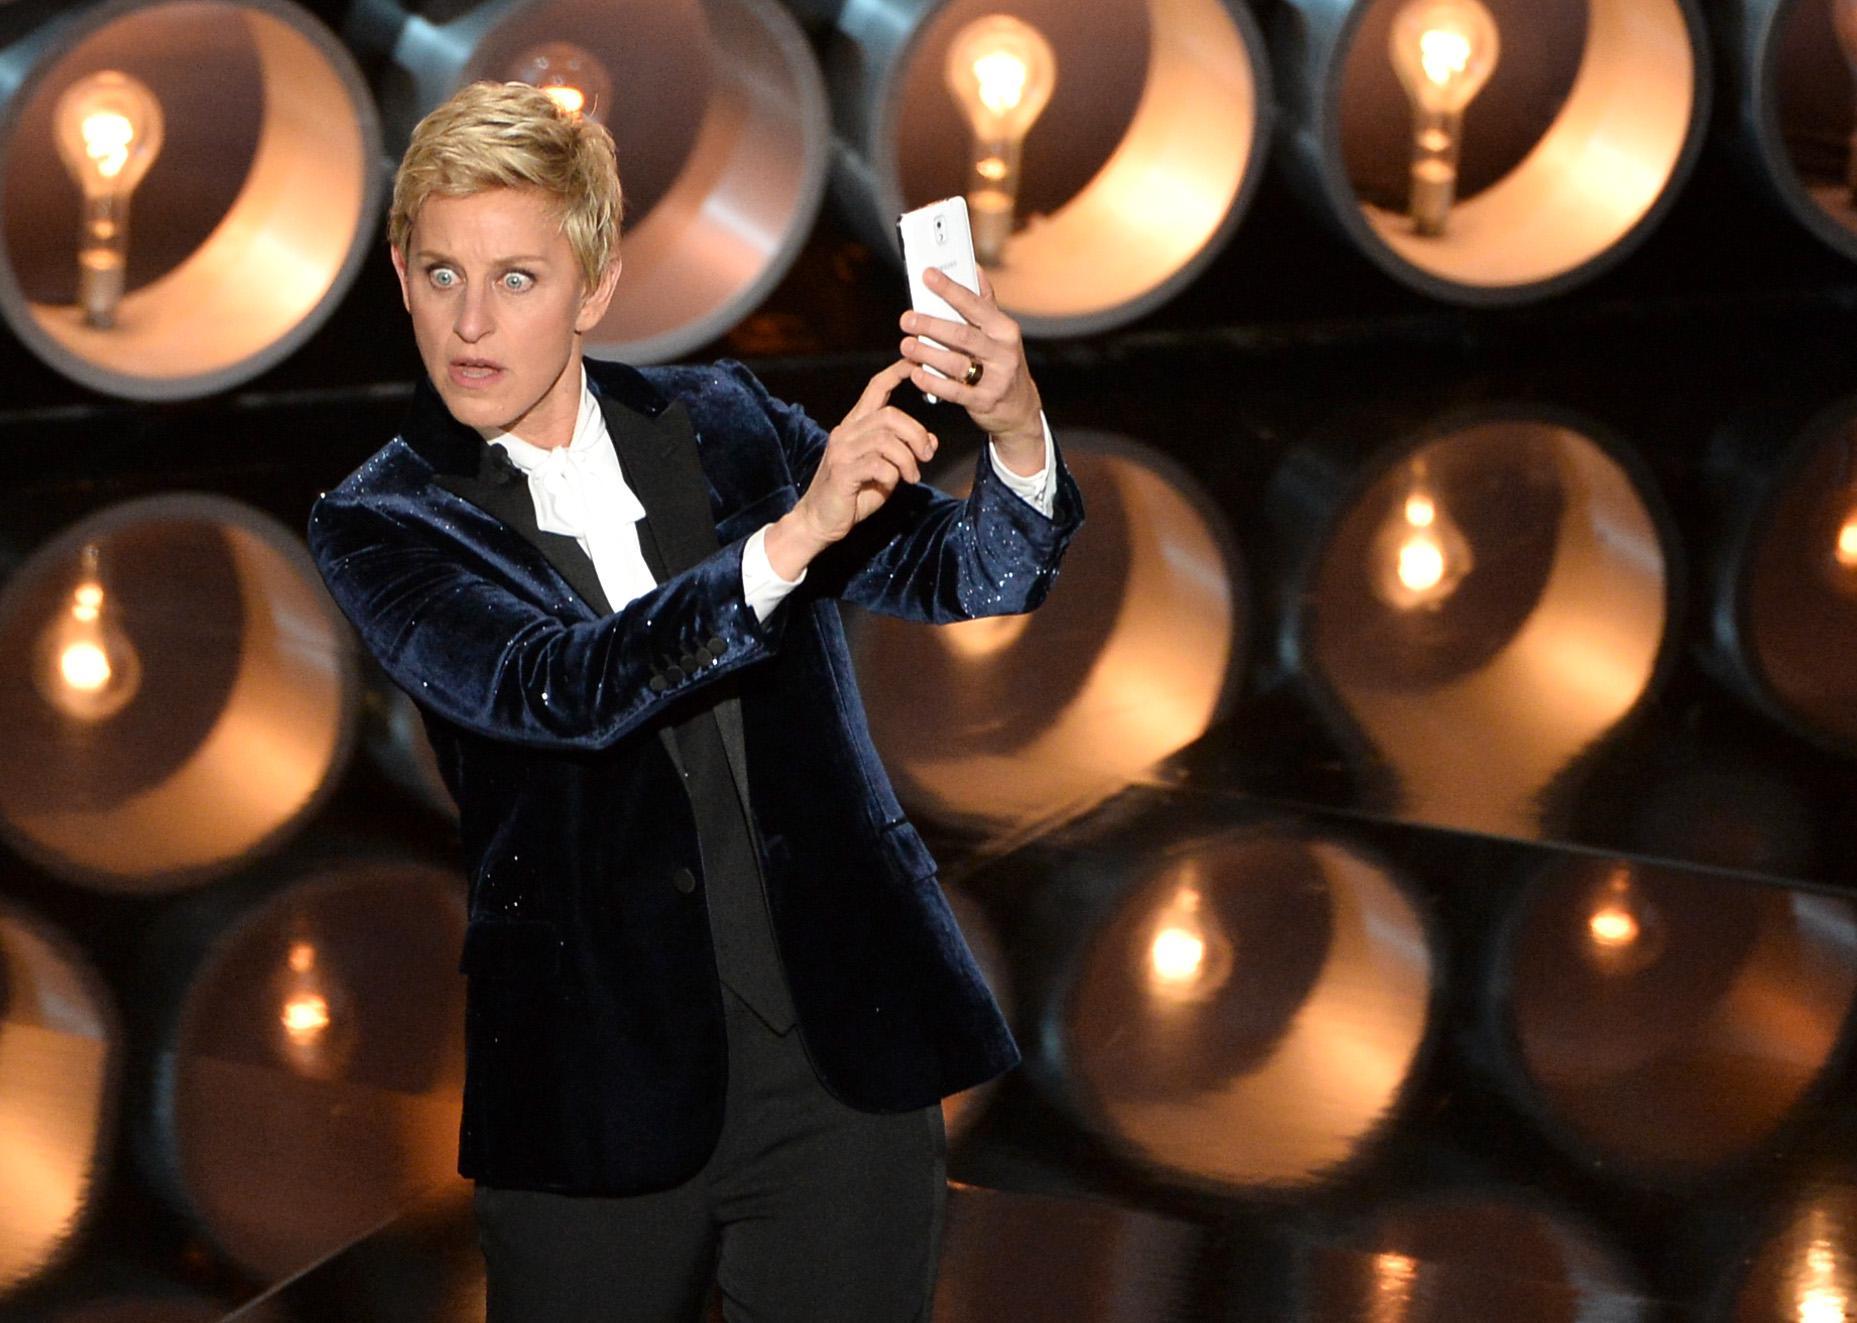 Ellen DeGeneres hosts the Oscars